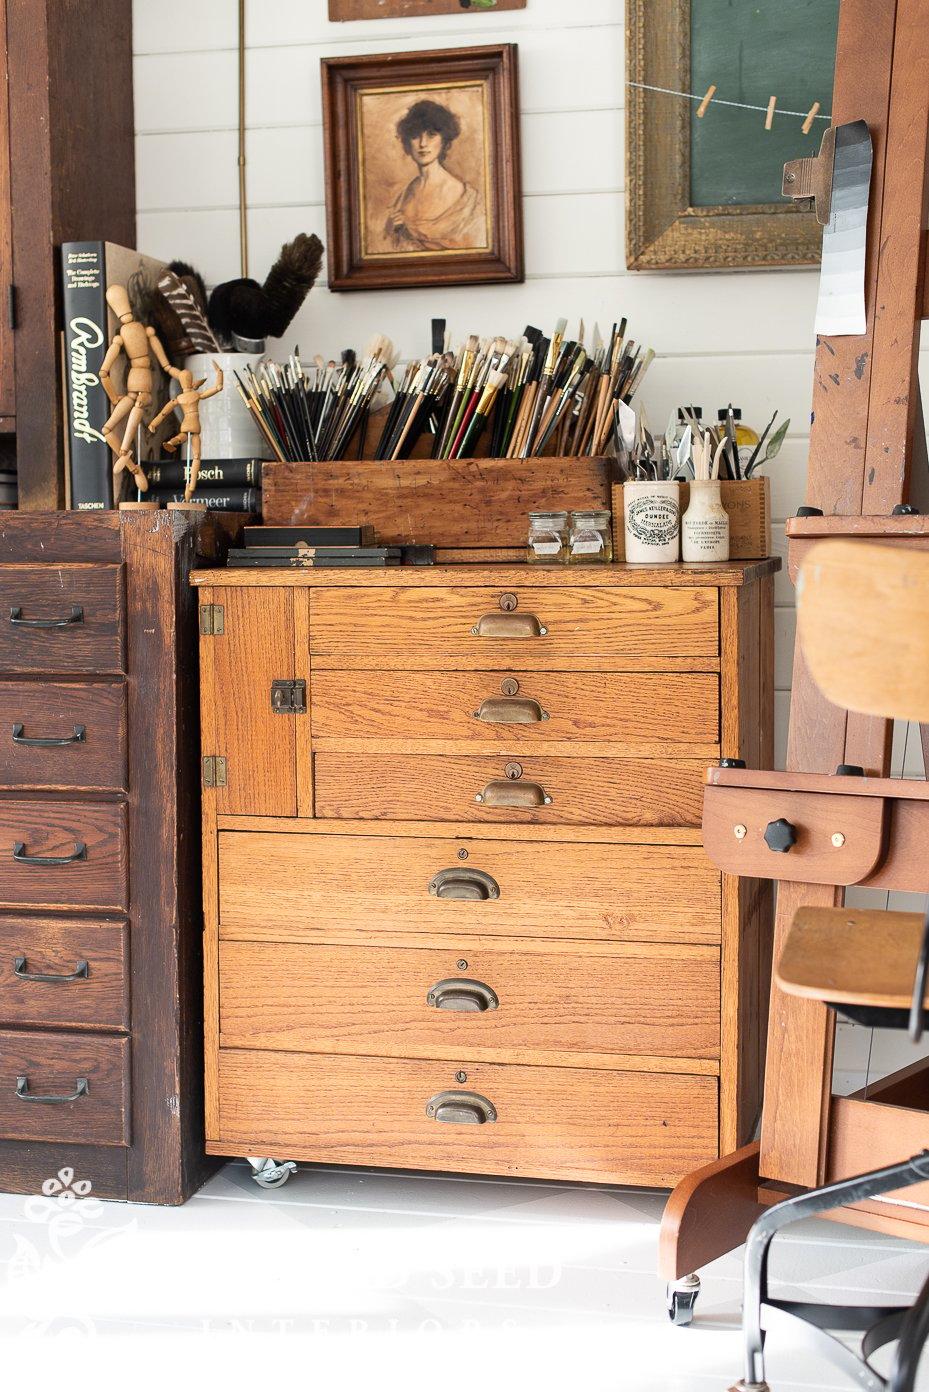 antique post office register | art studio | miss mustard seed